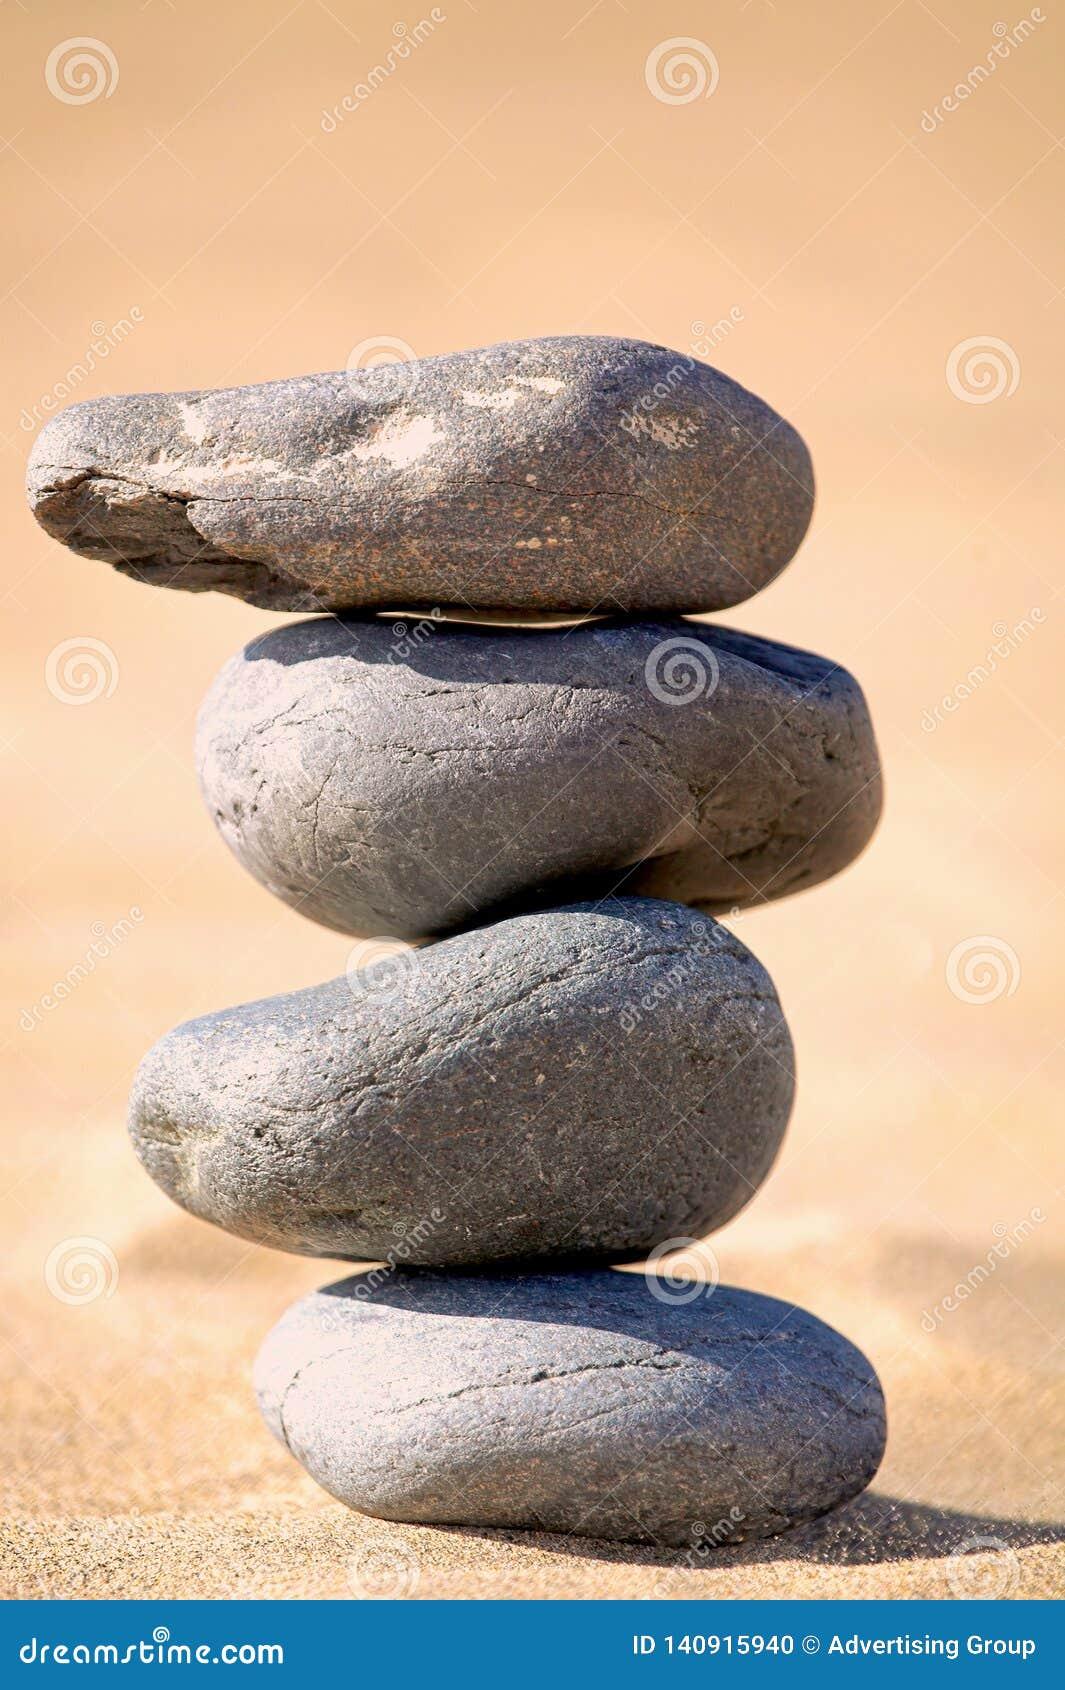 Balancing stones on a beach